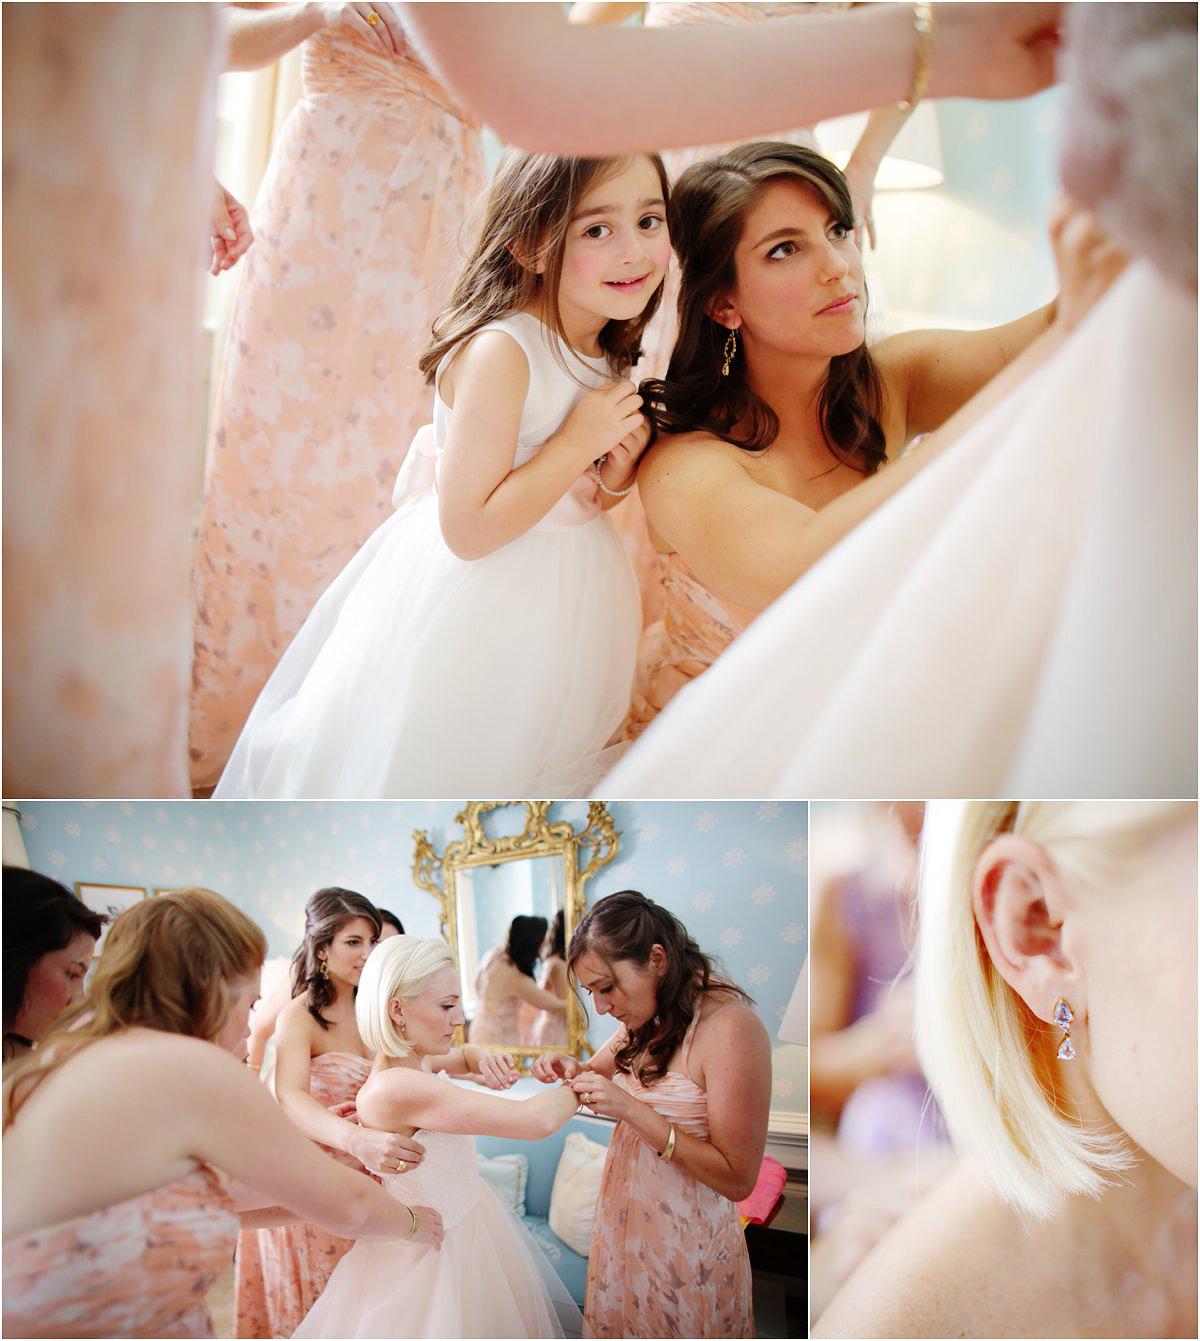 Country-Club-Virginia-Wedding-photographer-RVA-wedding04.jpg